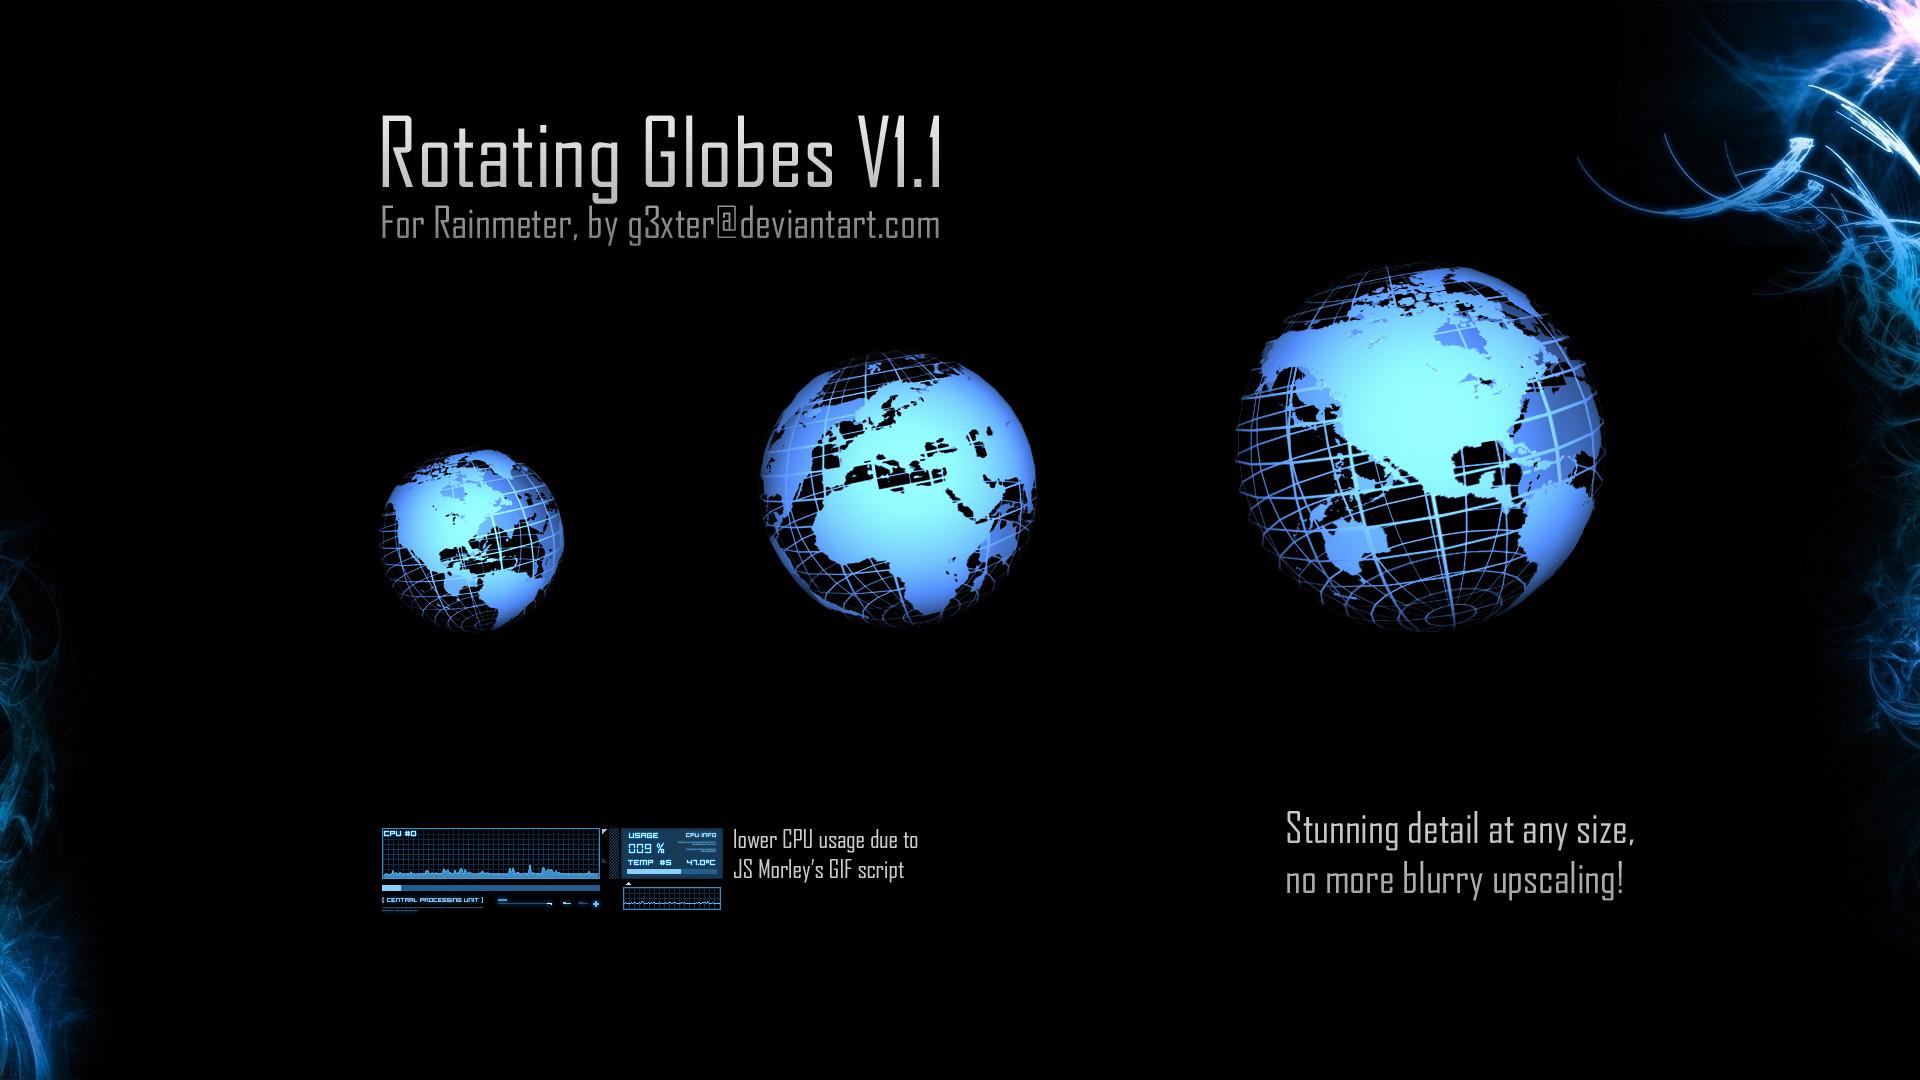 … Rotating Globes V1.1 by g3xter